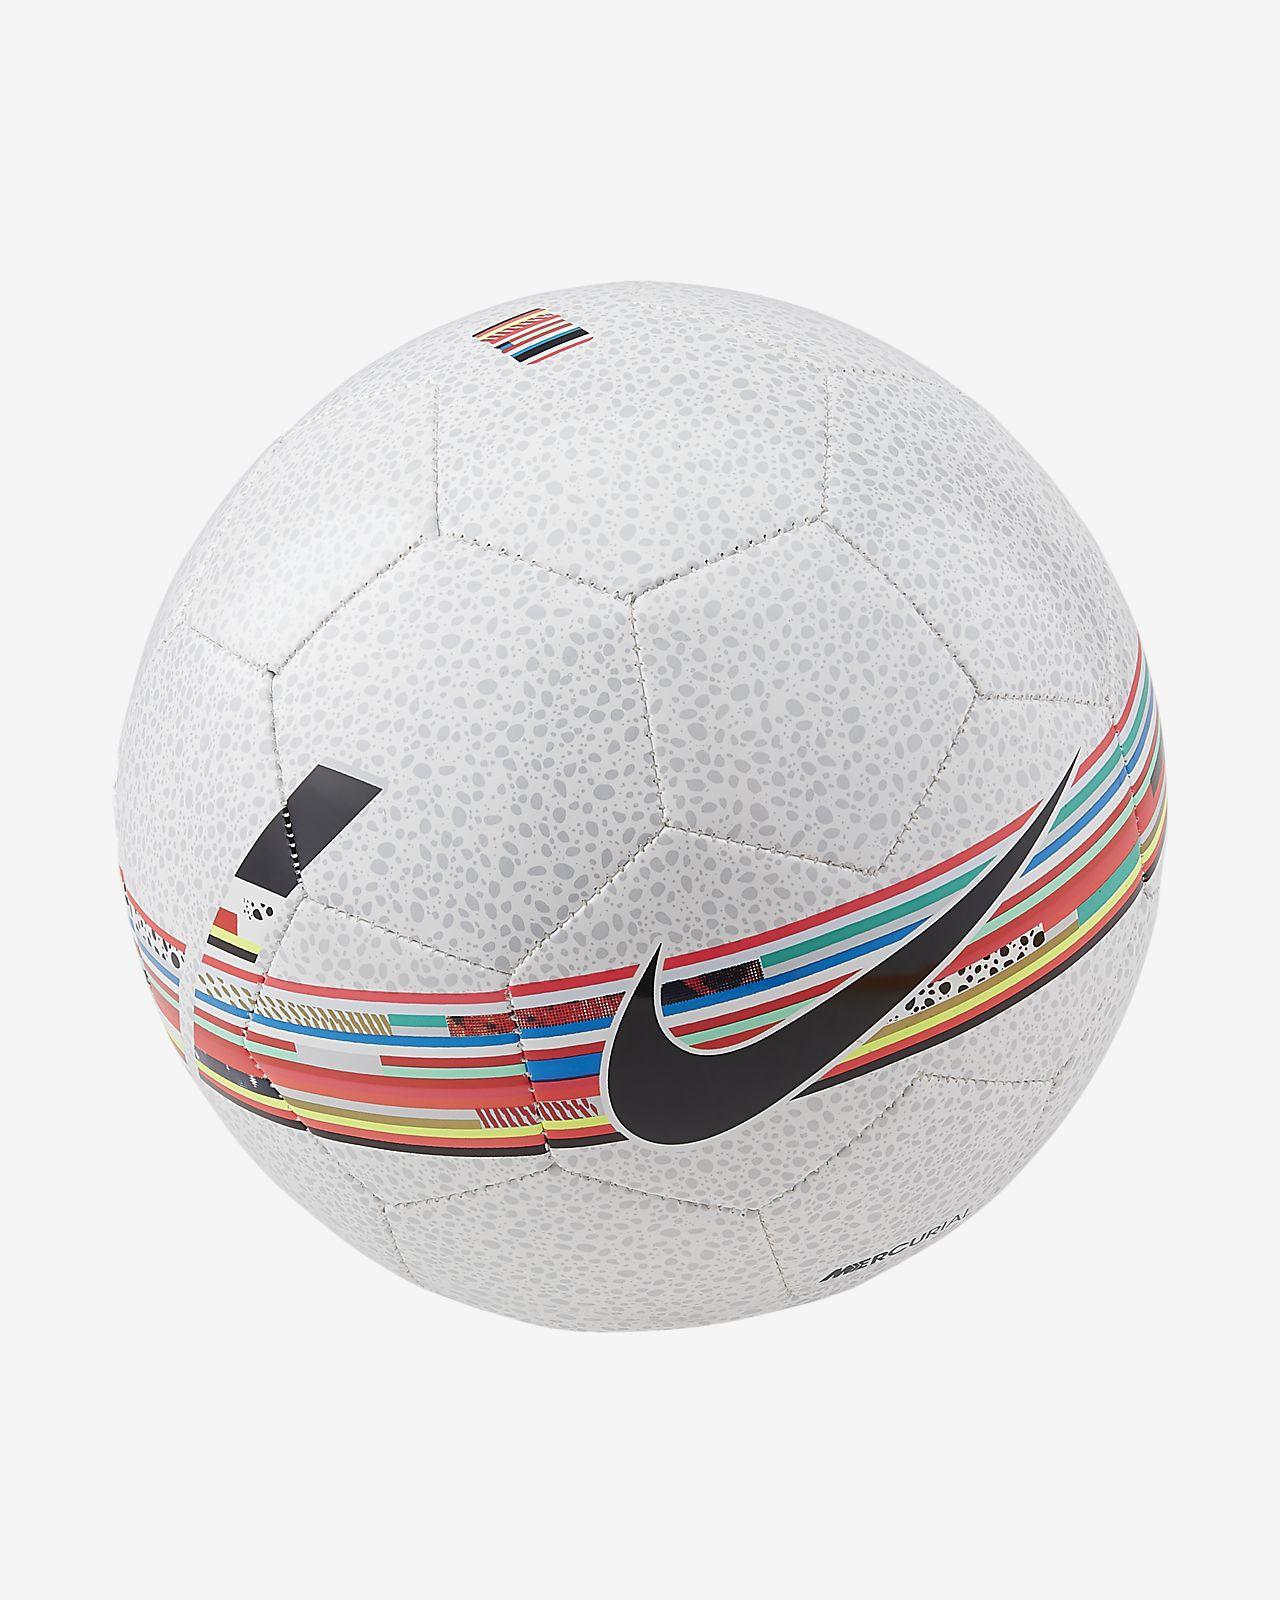 Nike Mercurial Prestige Fußball